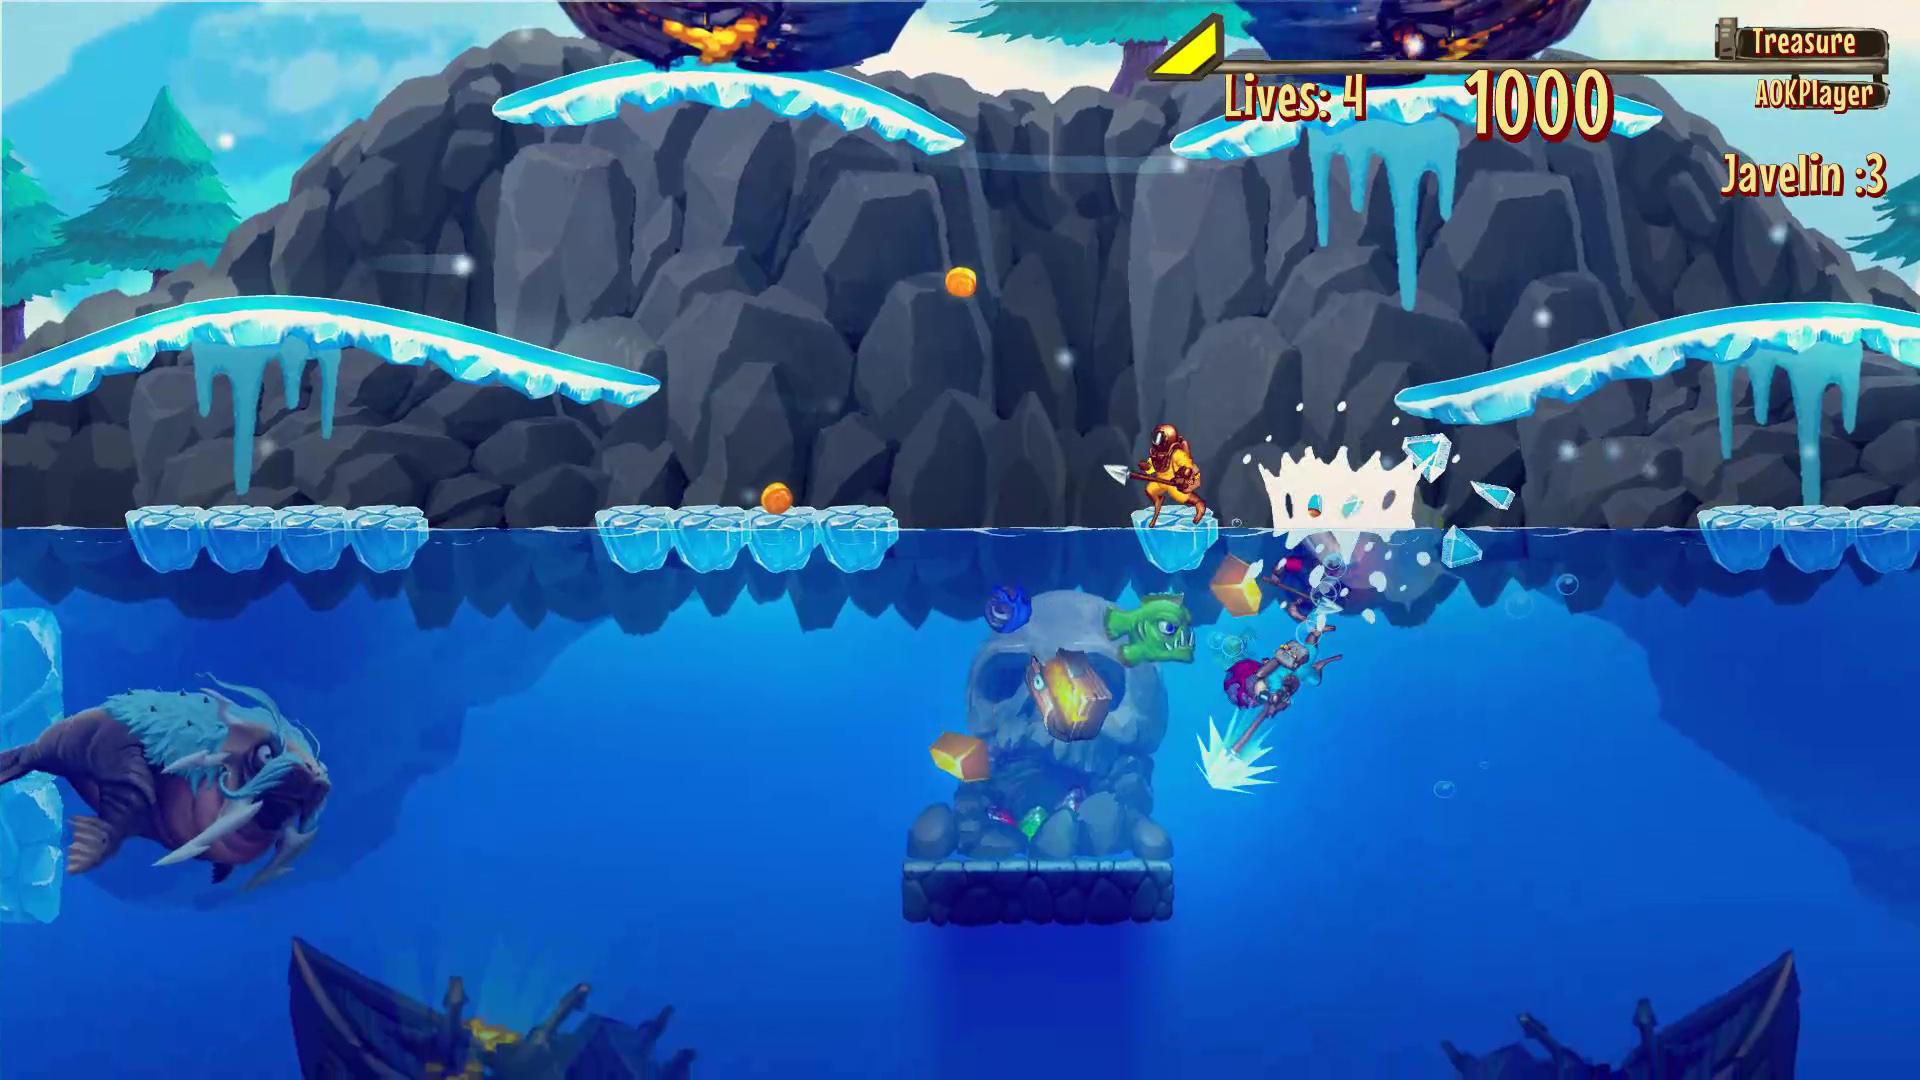 AquaLungers_2019-06-28-10h31m05s118.jpg